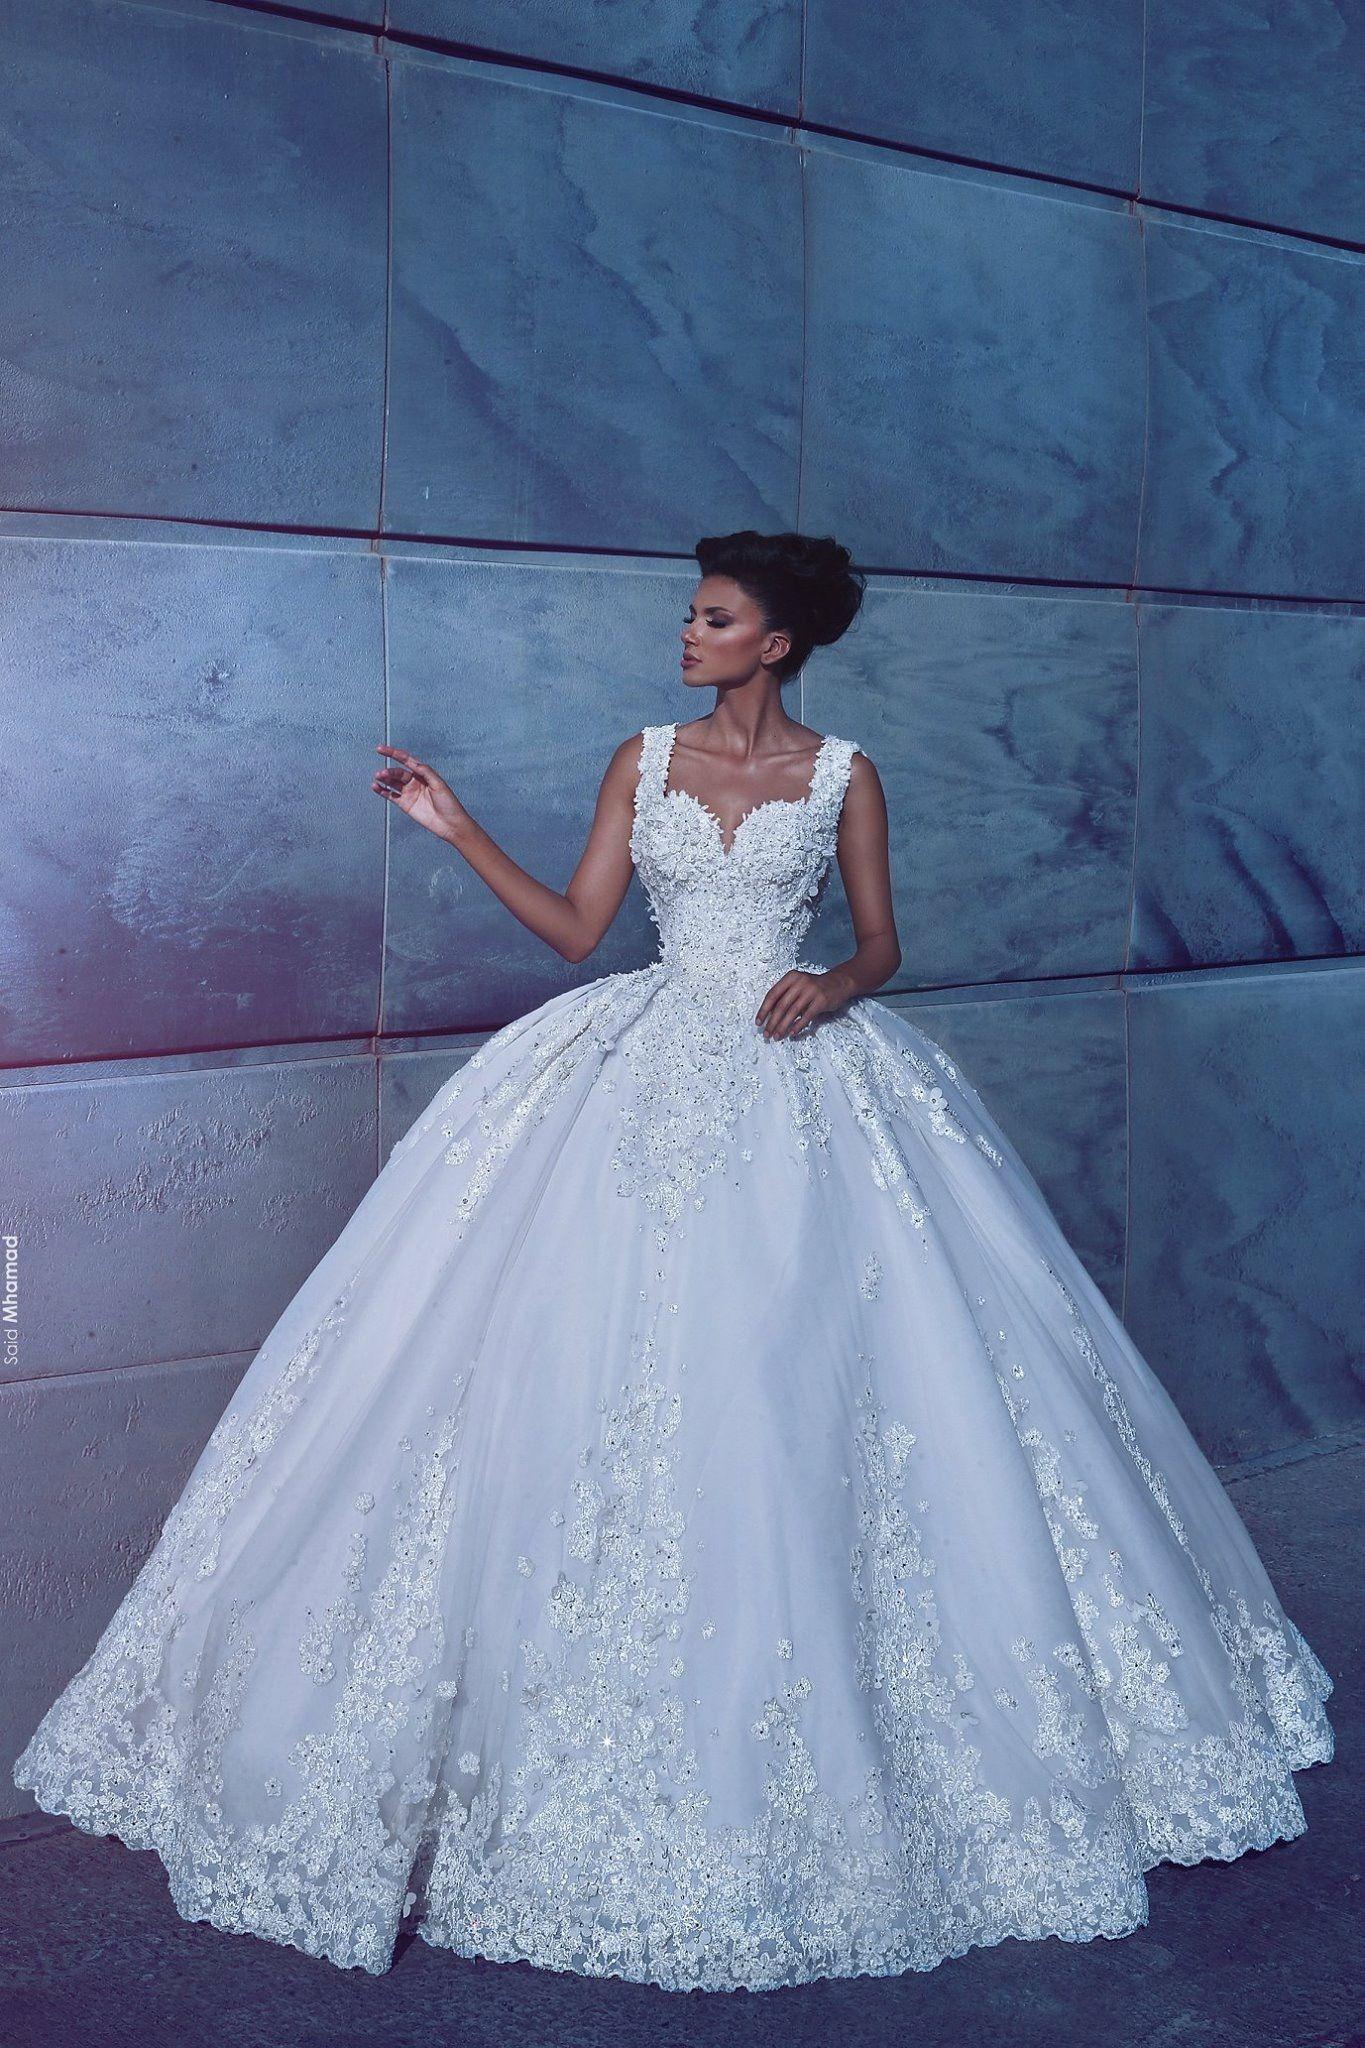 So nice | 4 wedding | Pinterest | Nice, Wedding dress and Bridal dresses